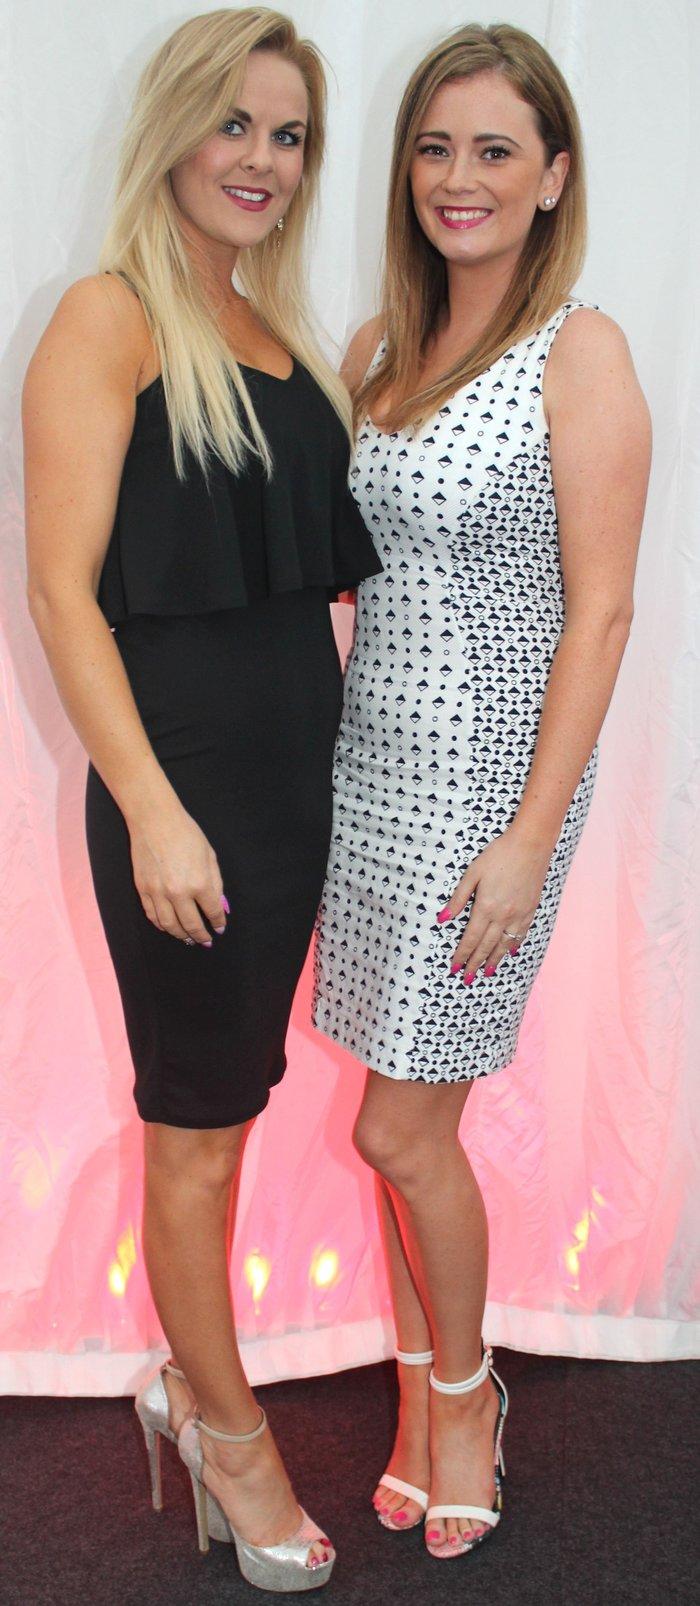 Dawn Jnr O'Sullivan and Aisling O'Sullivan at the Rose Fashion Show on Sunday night. Photo by Gavin O'Connor